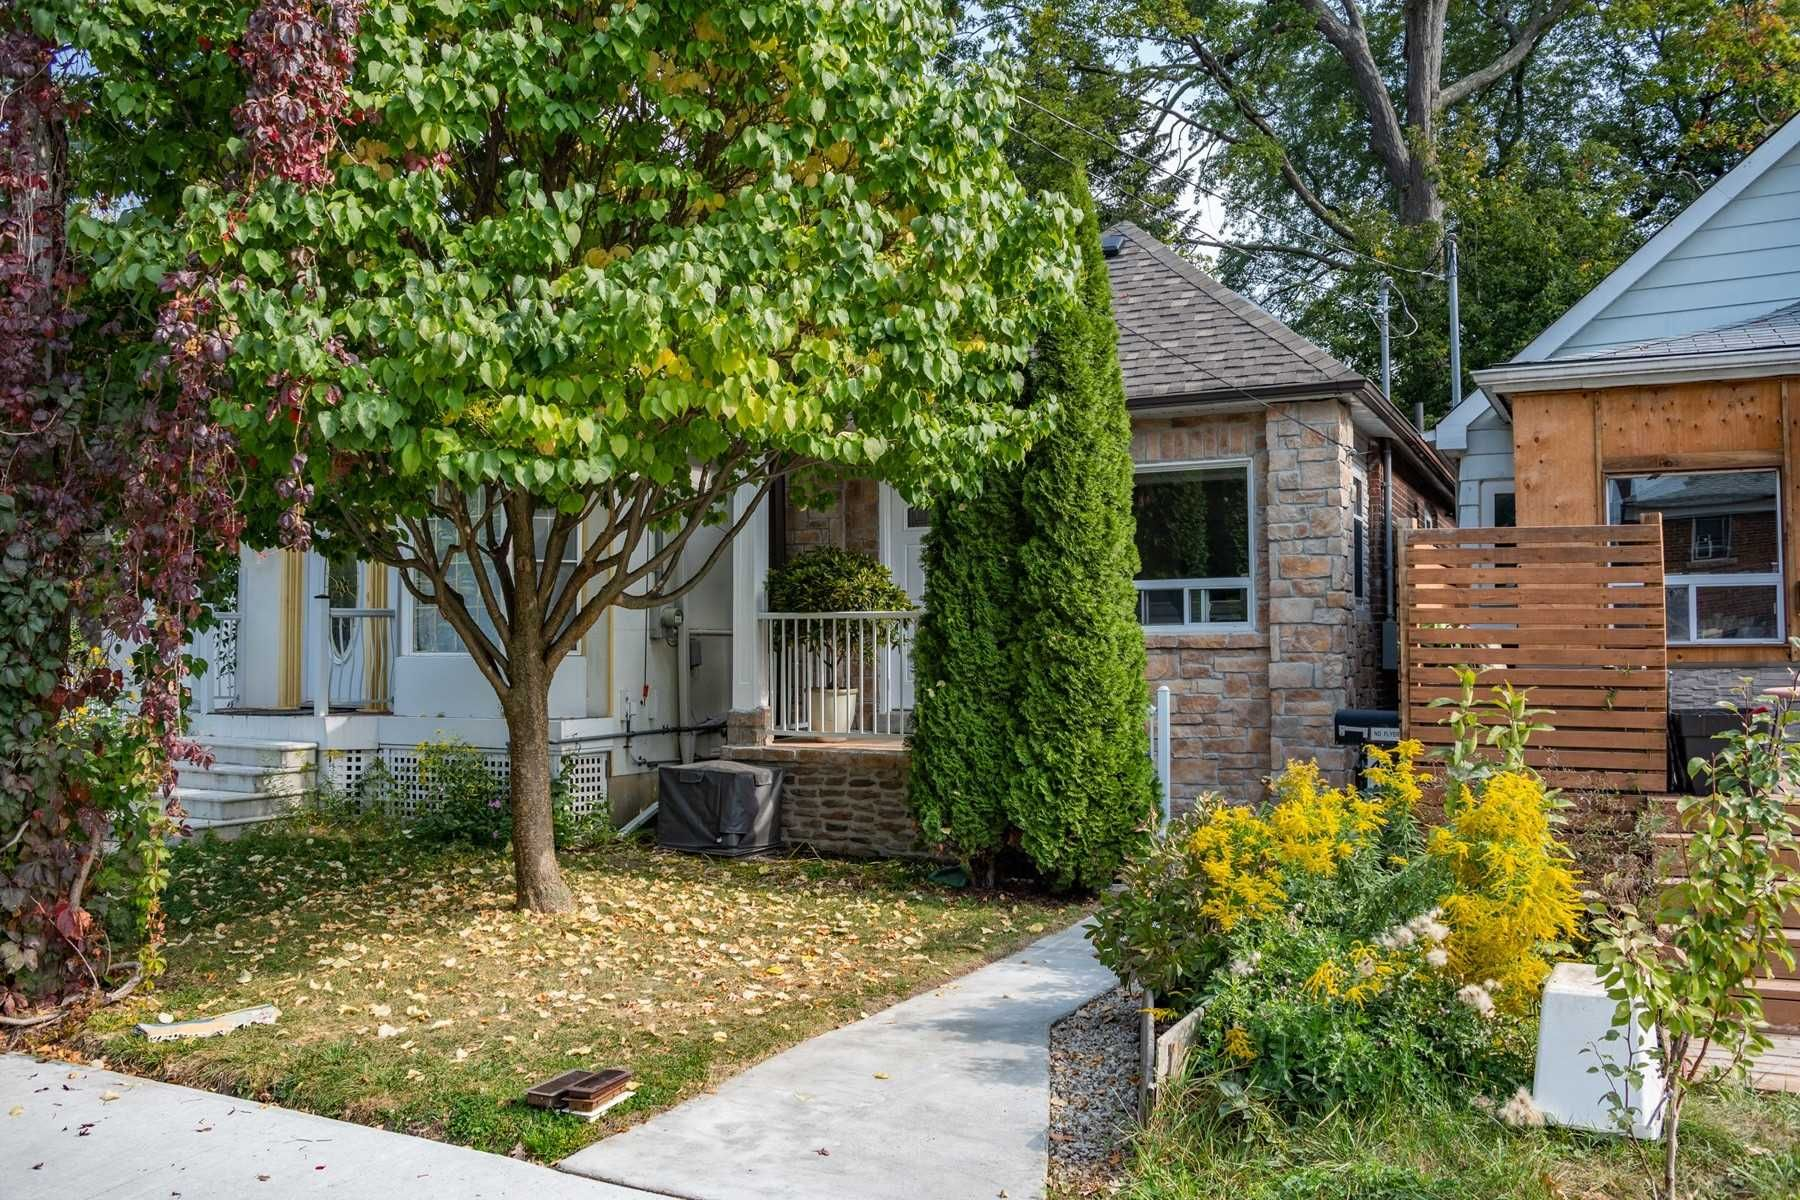 Main Photo: 41 Mcdonald Avenue in Toronto: Oakridge House (Bungaloft) for sale (Toronto E06)  : MLS®# E4932098